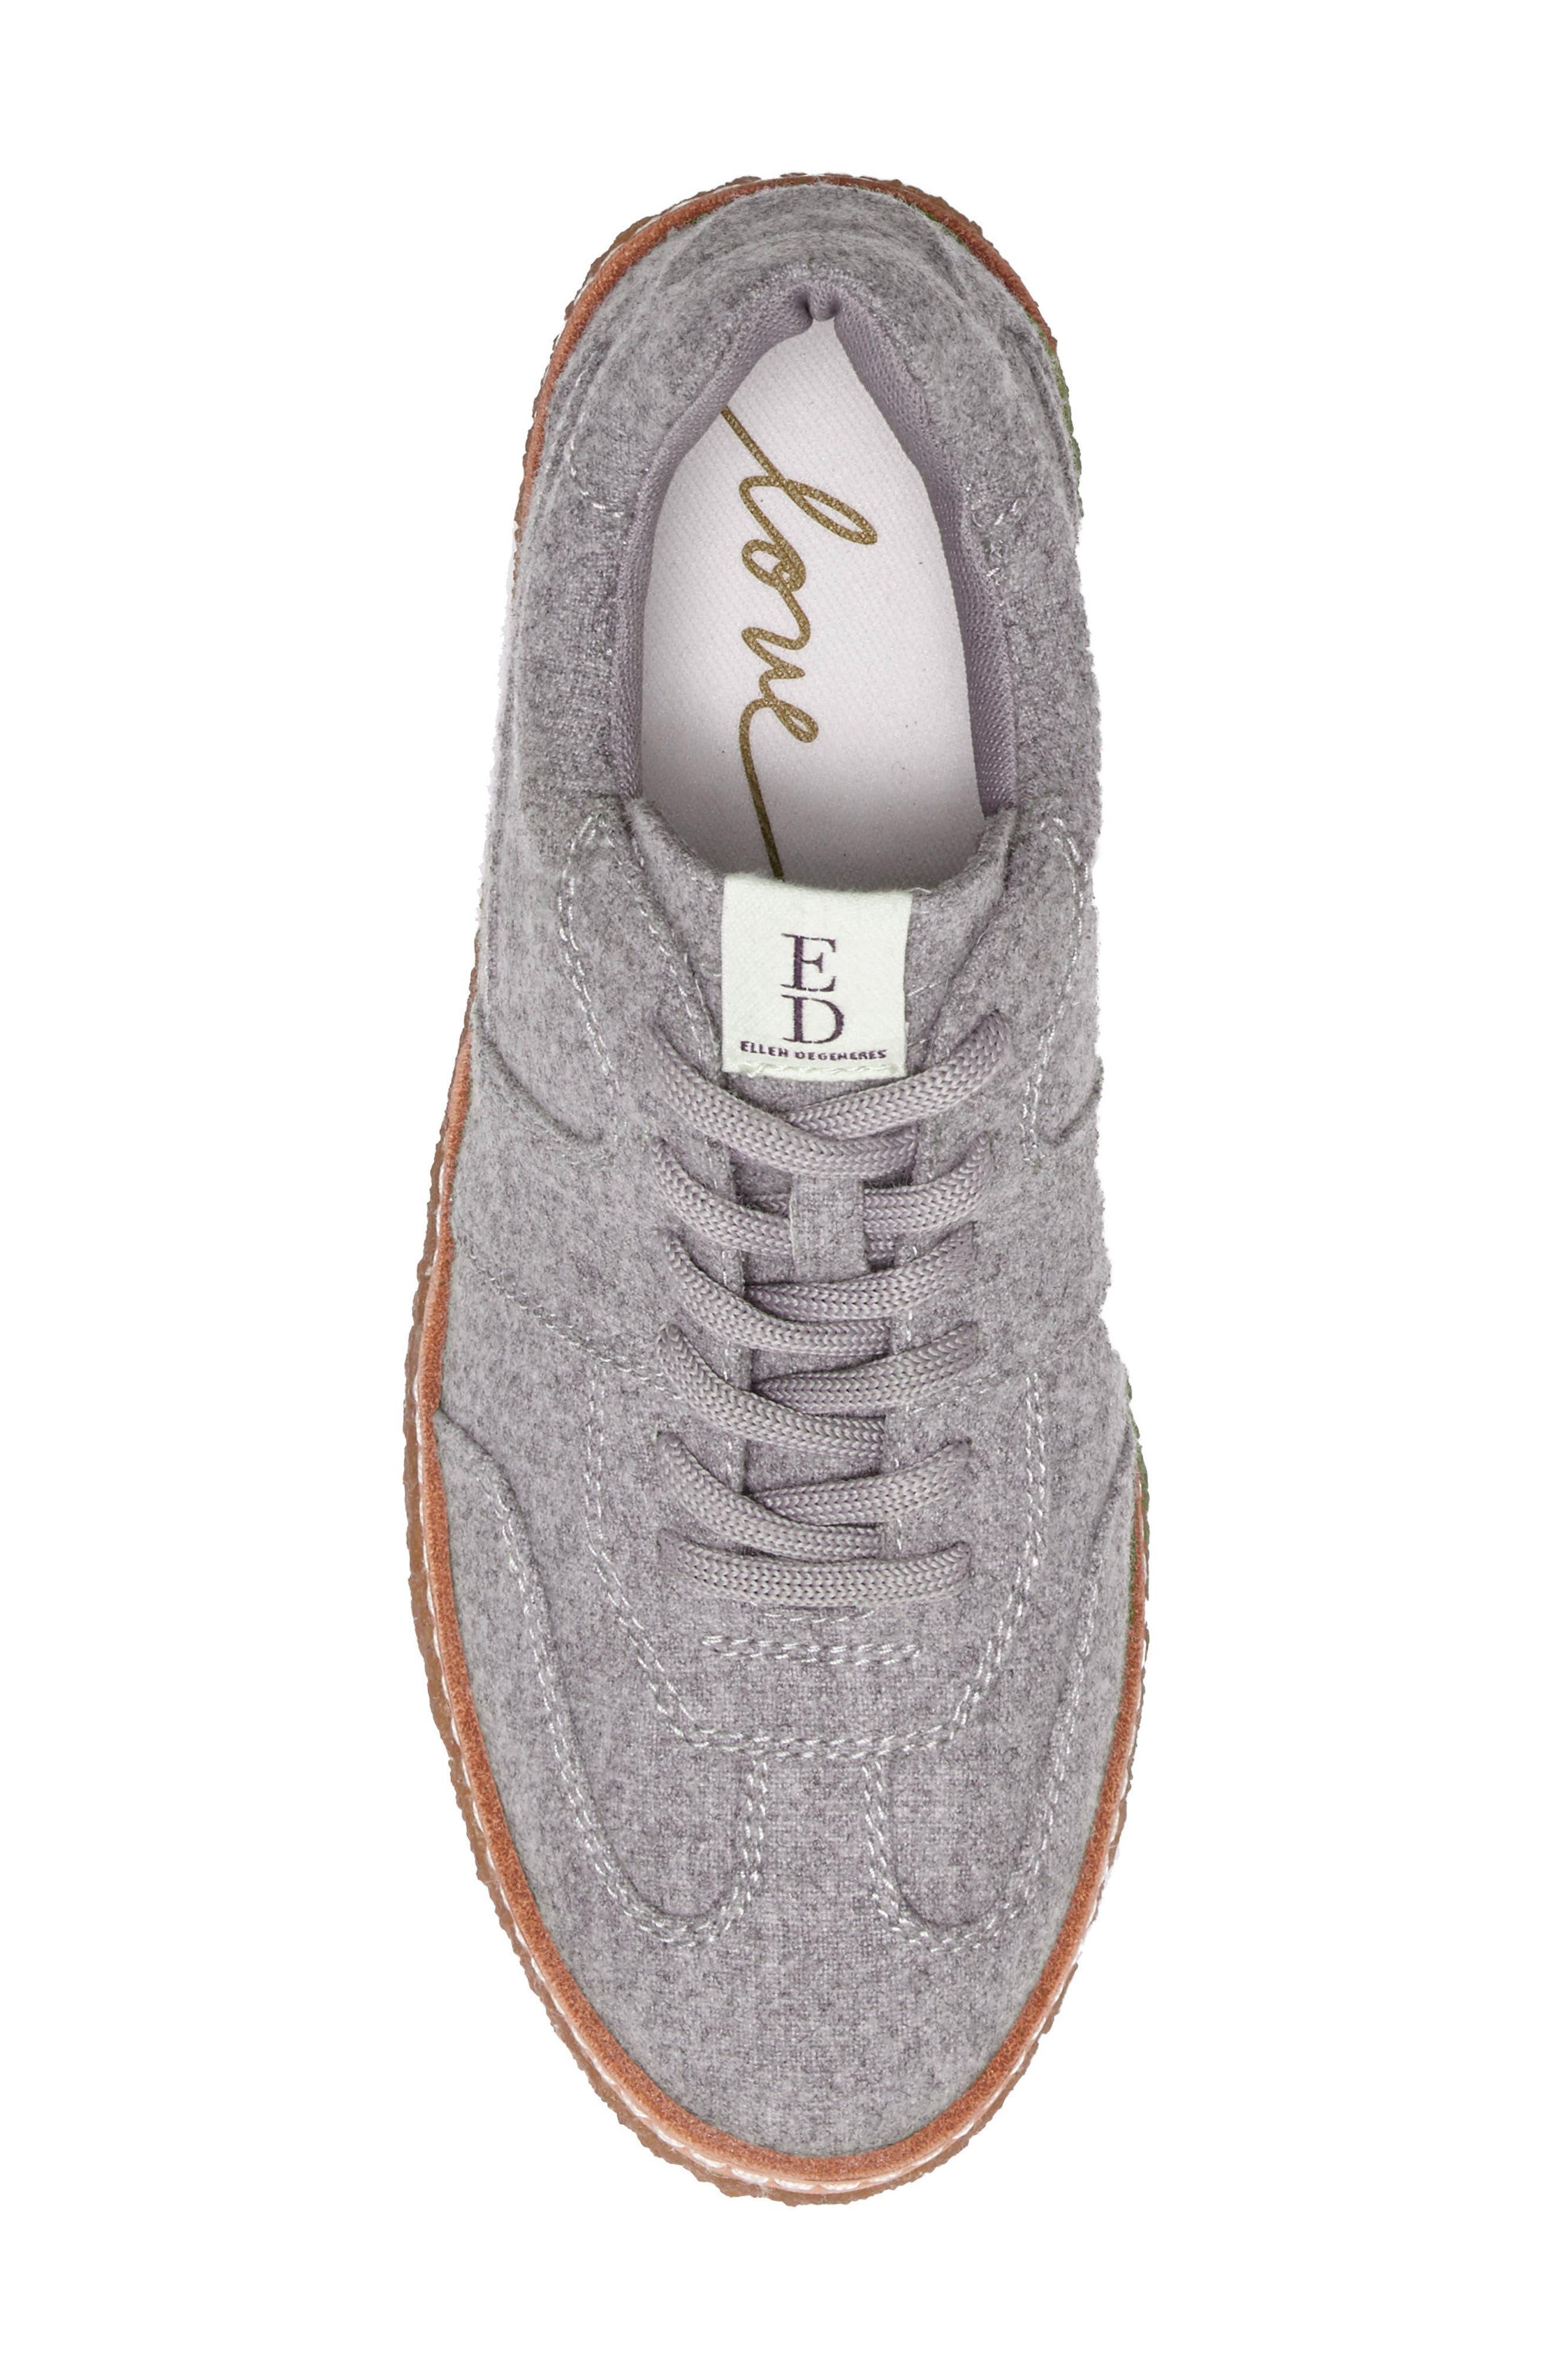 Danby Sneaker,                             Alternate thumbnail 4, color,                             022